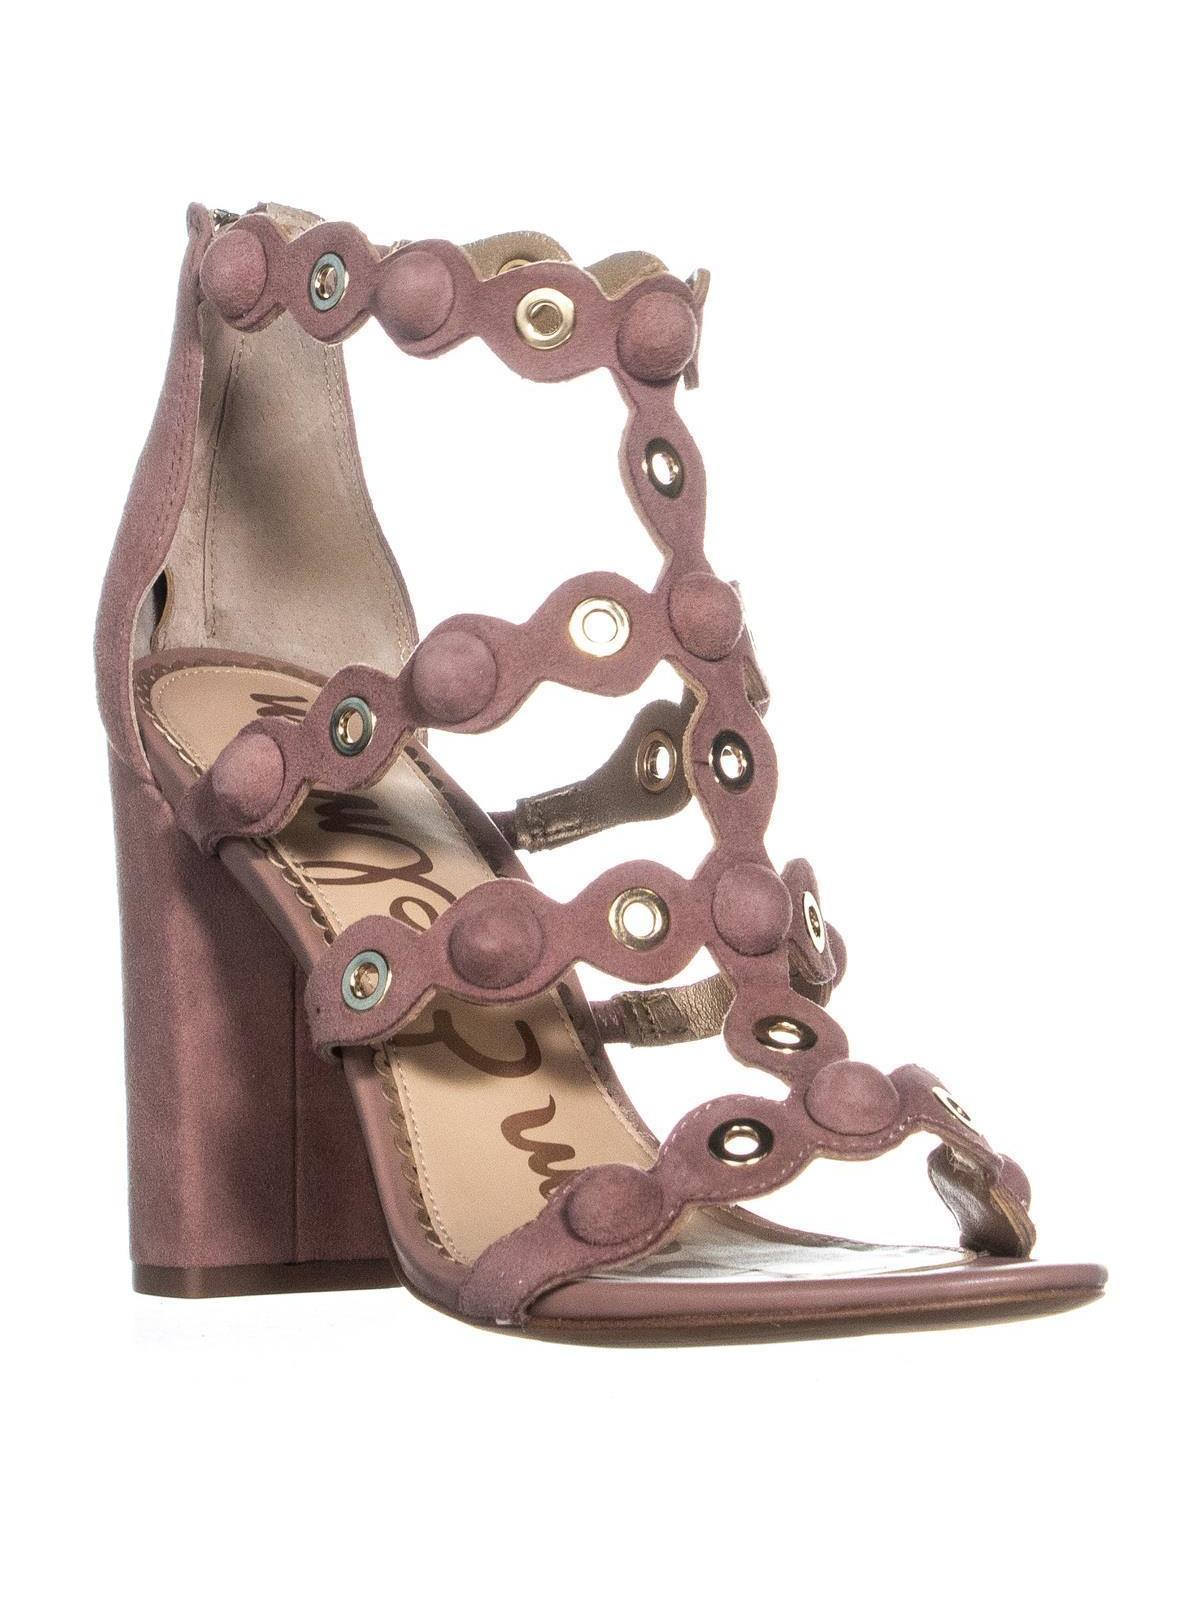 Womens Sam Edelman Yuli Strappy Heeled Sandals, Dusty Rose